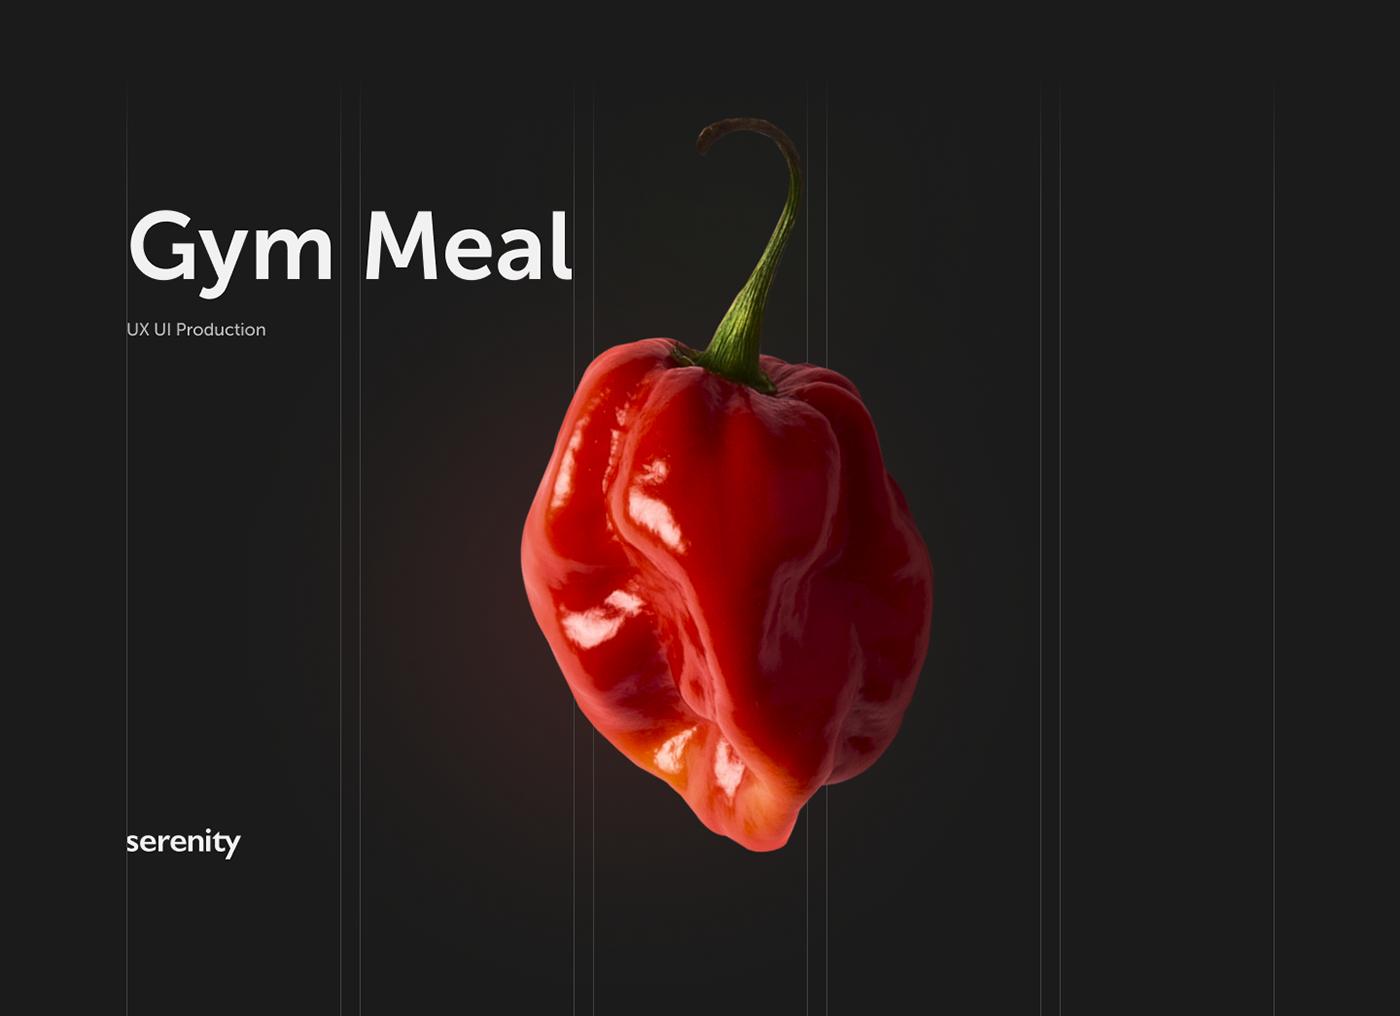 Food  meal еда спорт vegetables овощи мясо Fruit фрукты сервис